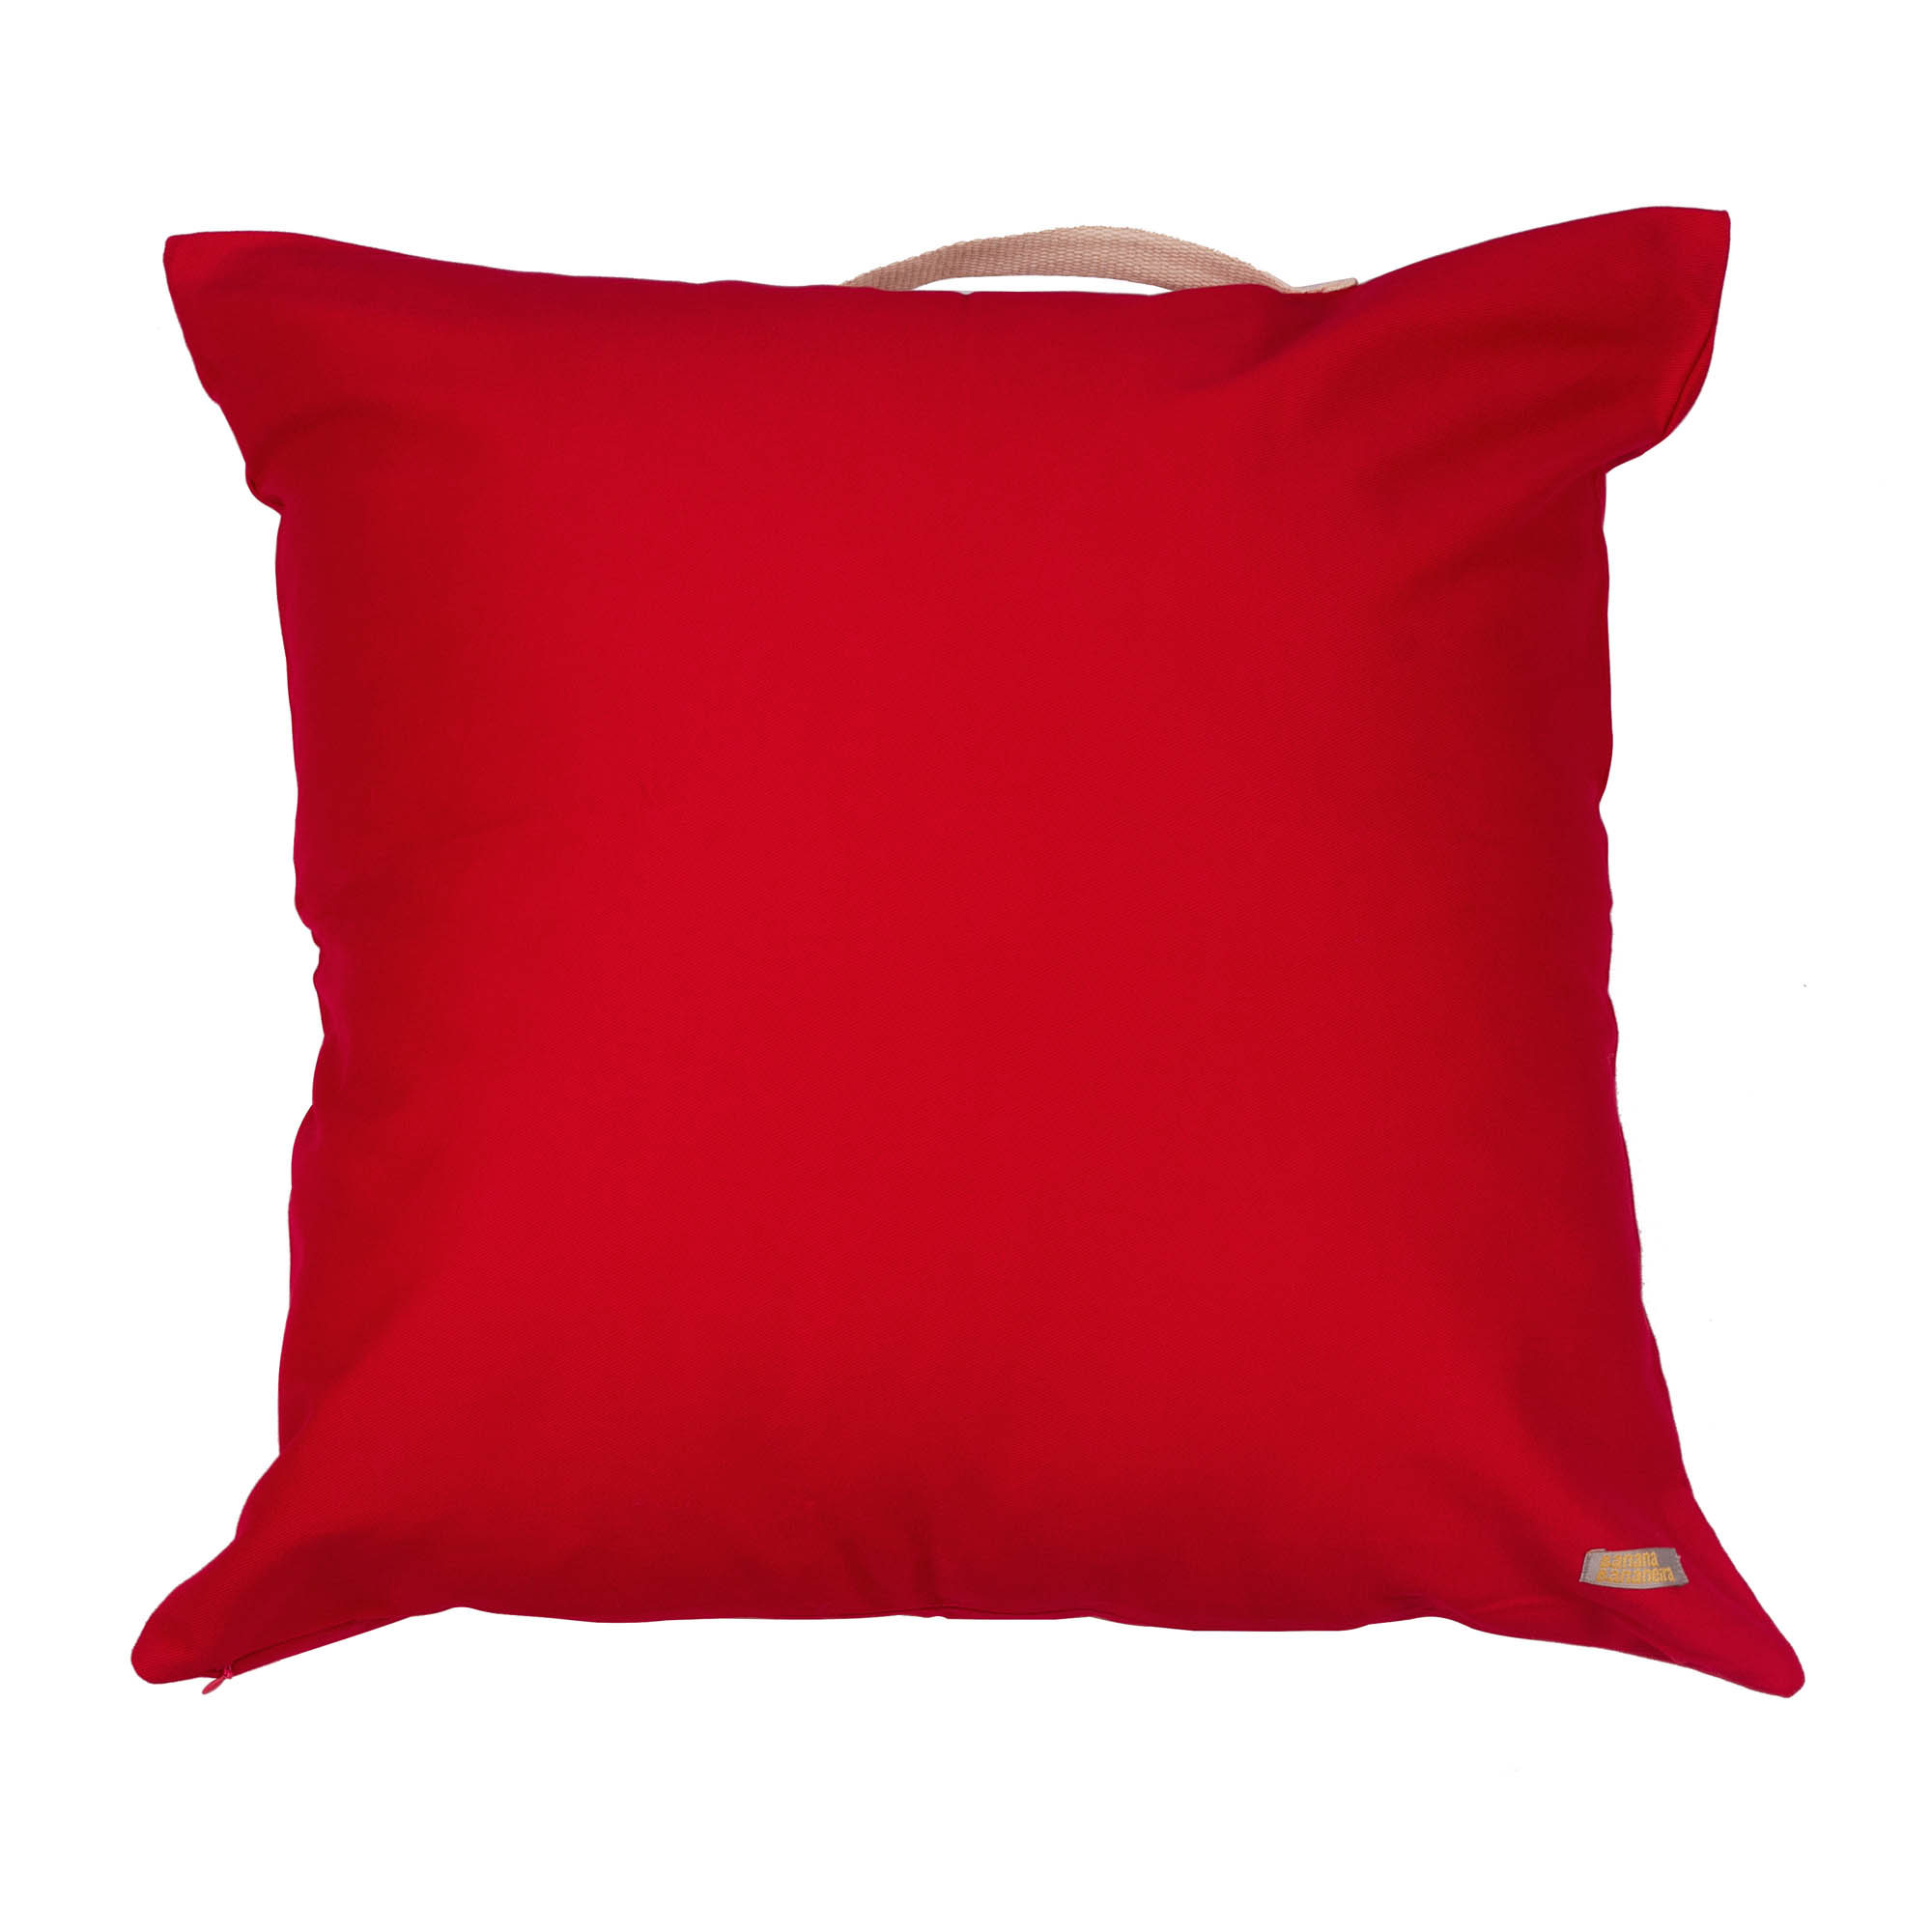 Almofadão vermelho